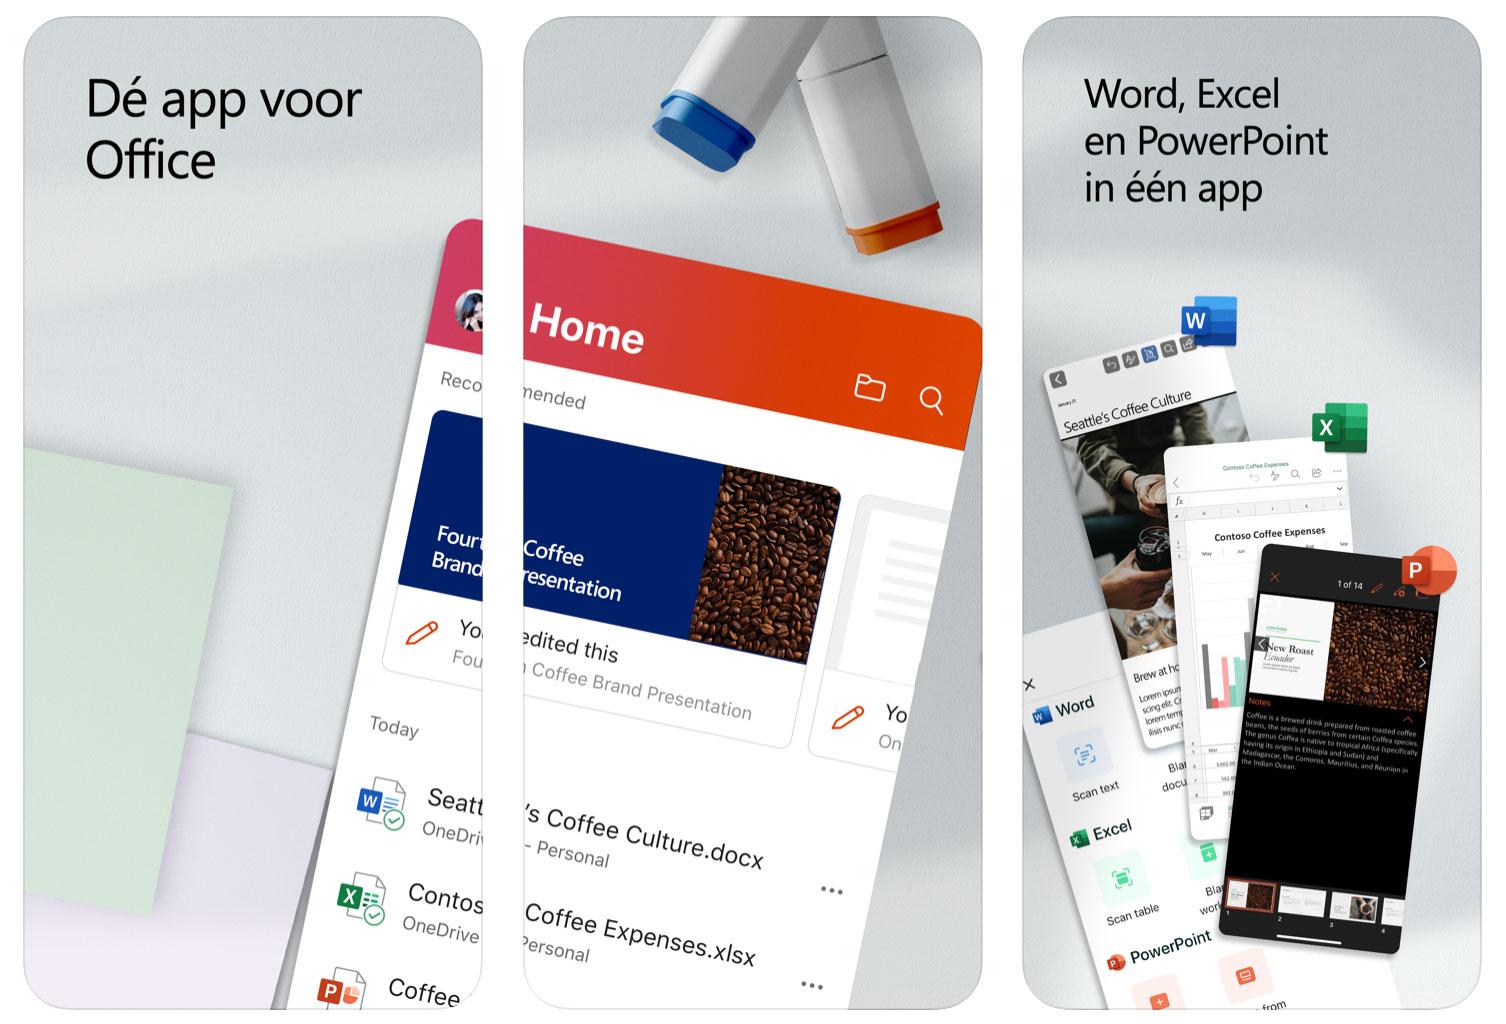 https://www.macfreak.nl/modules/news/images/zArt.MicrosoftOffice-app-iOS-iPadOS.jpg